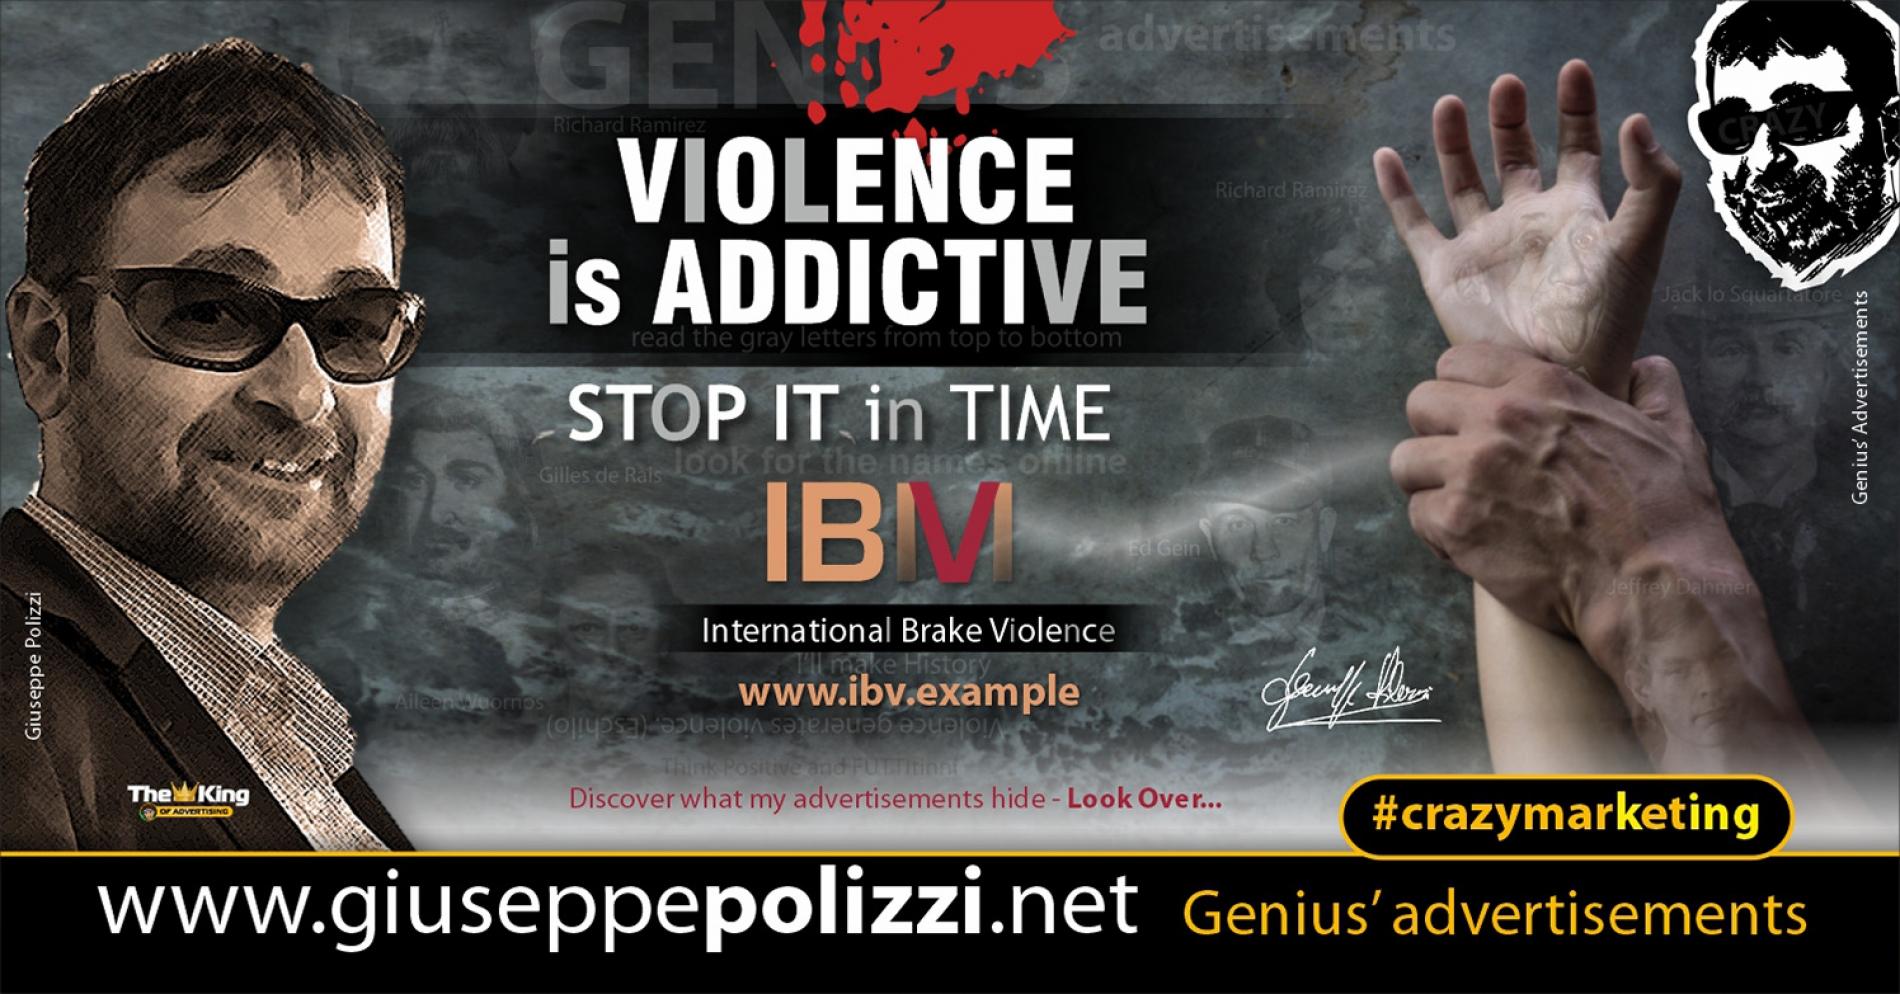 giuseppe polizzi crazymarketing Violence is Addictive advertisements